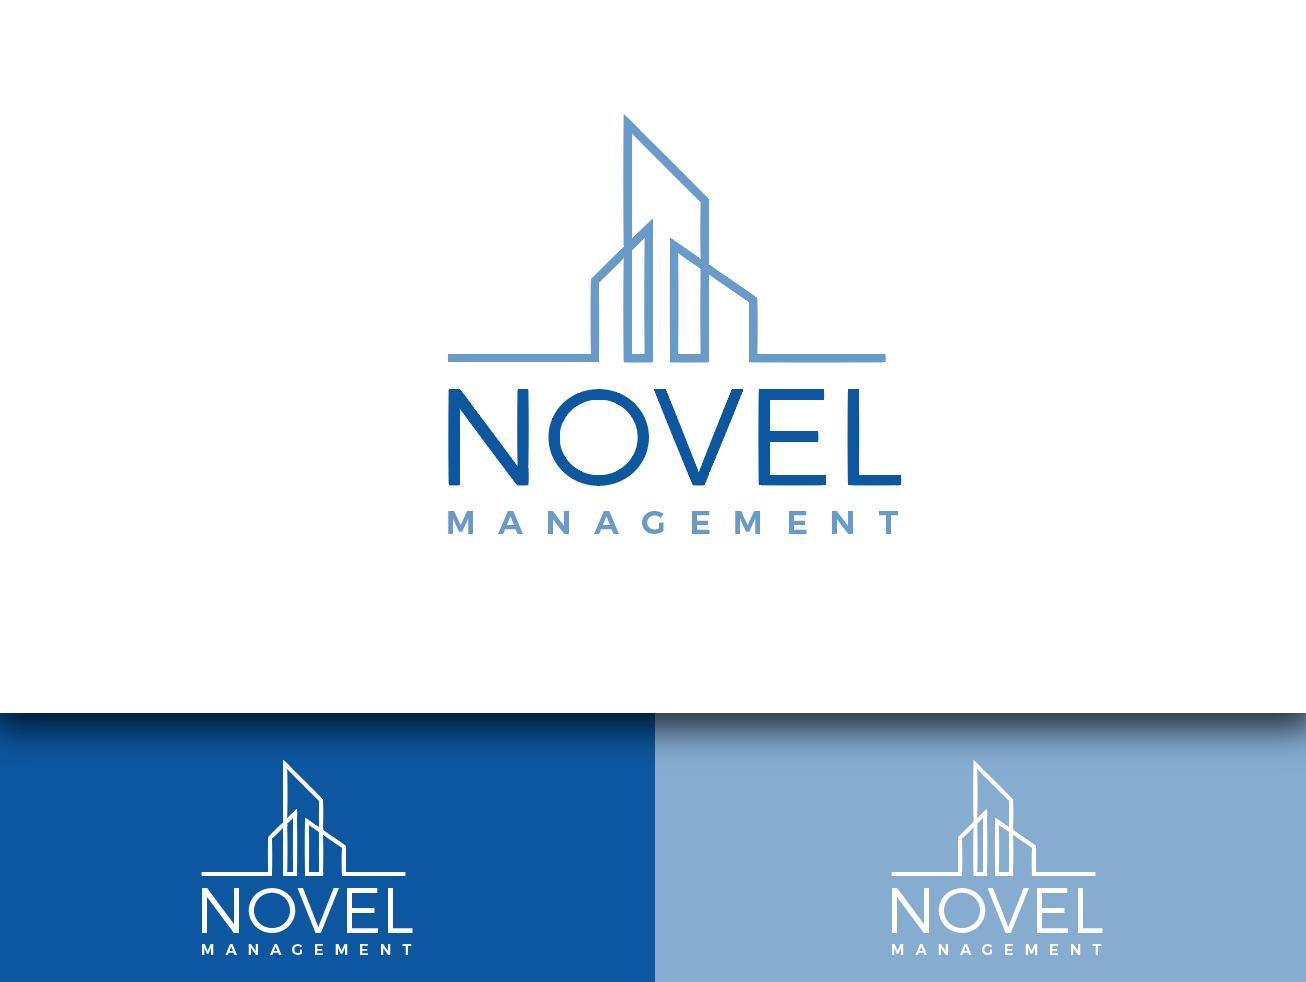 60 Great Building Logo Designs for Inspiration - Hative   Property Management Logo Ideas